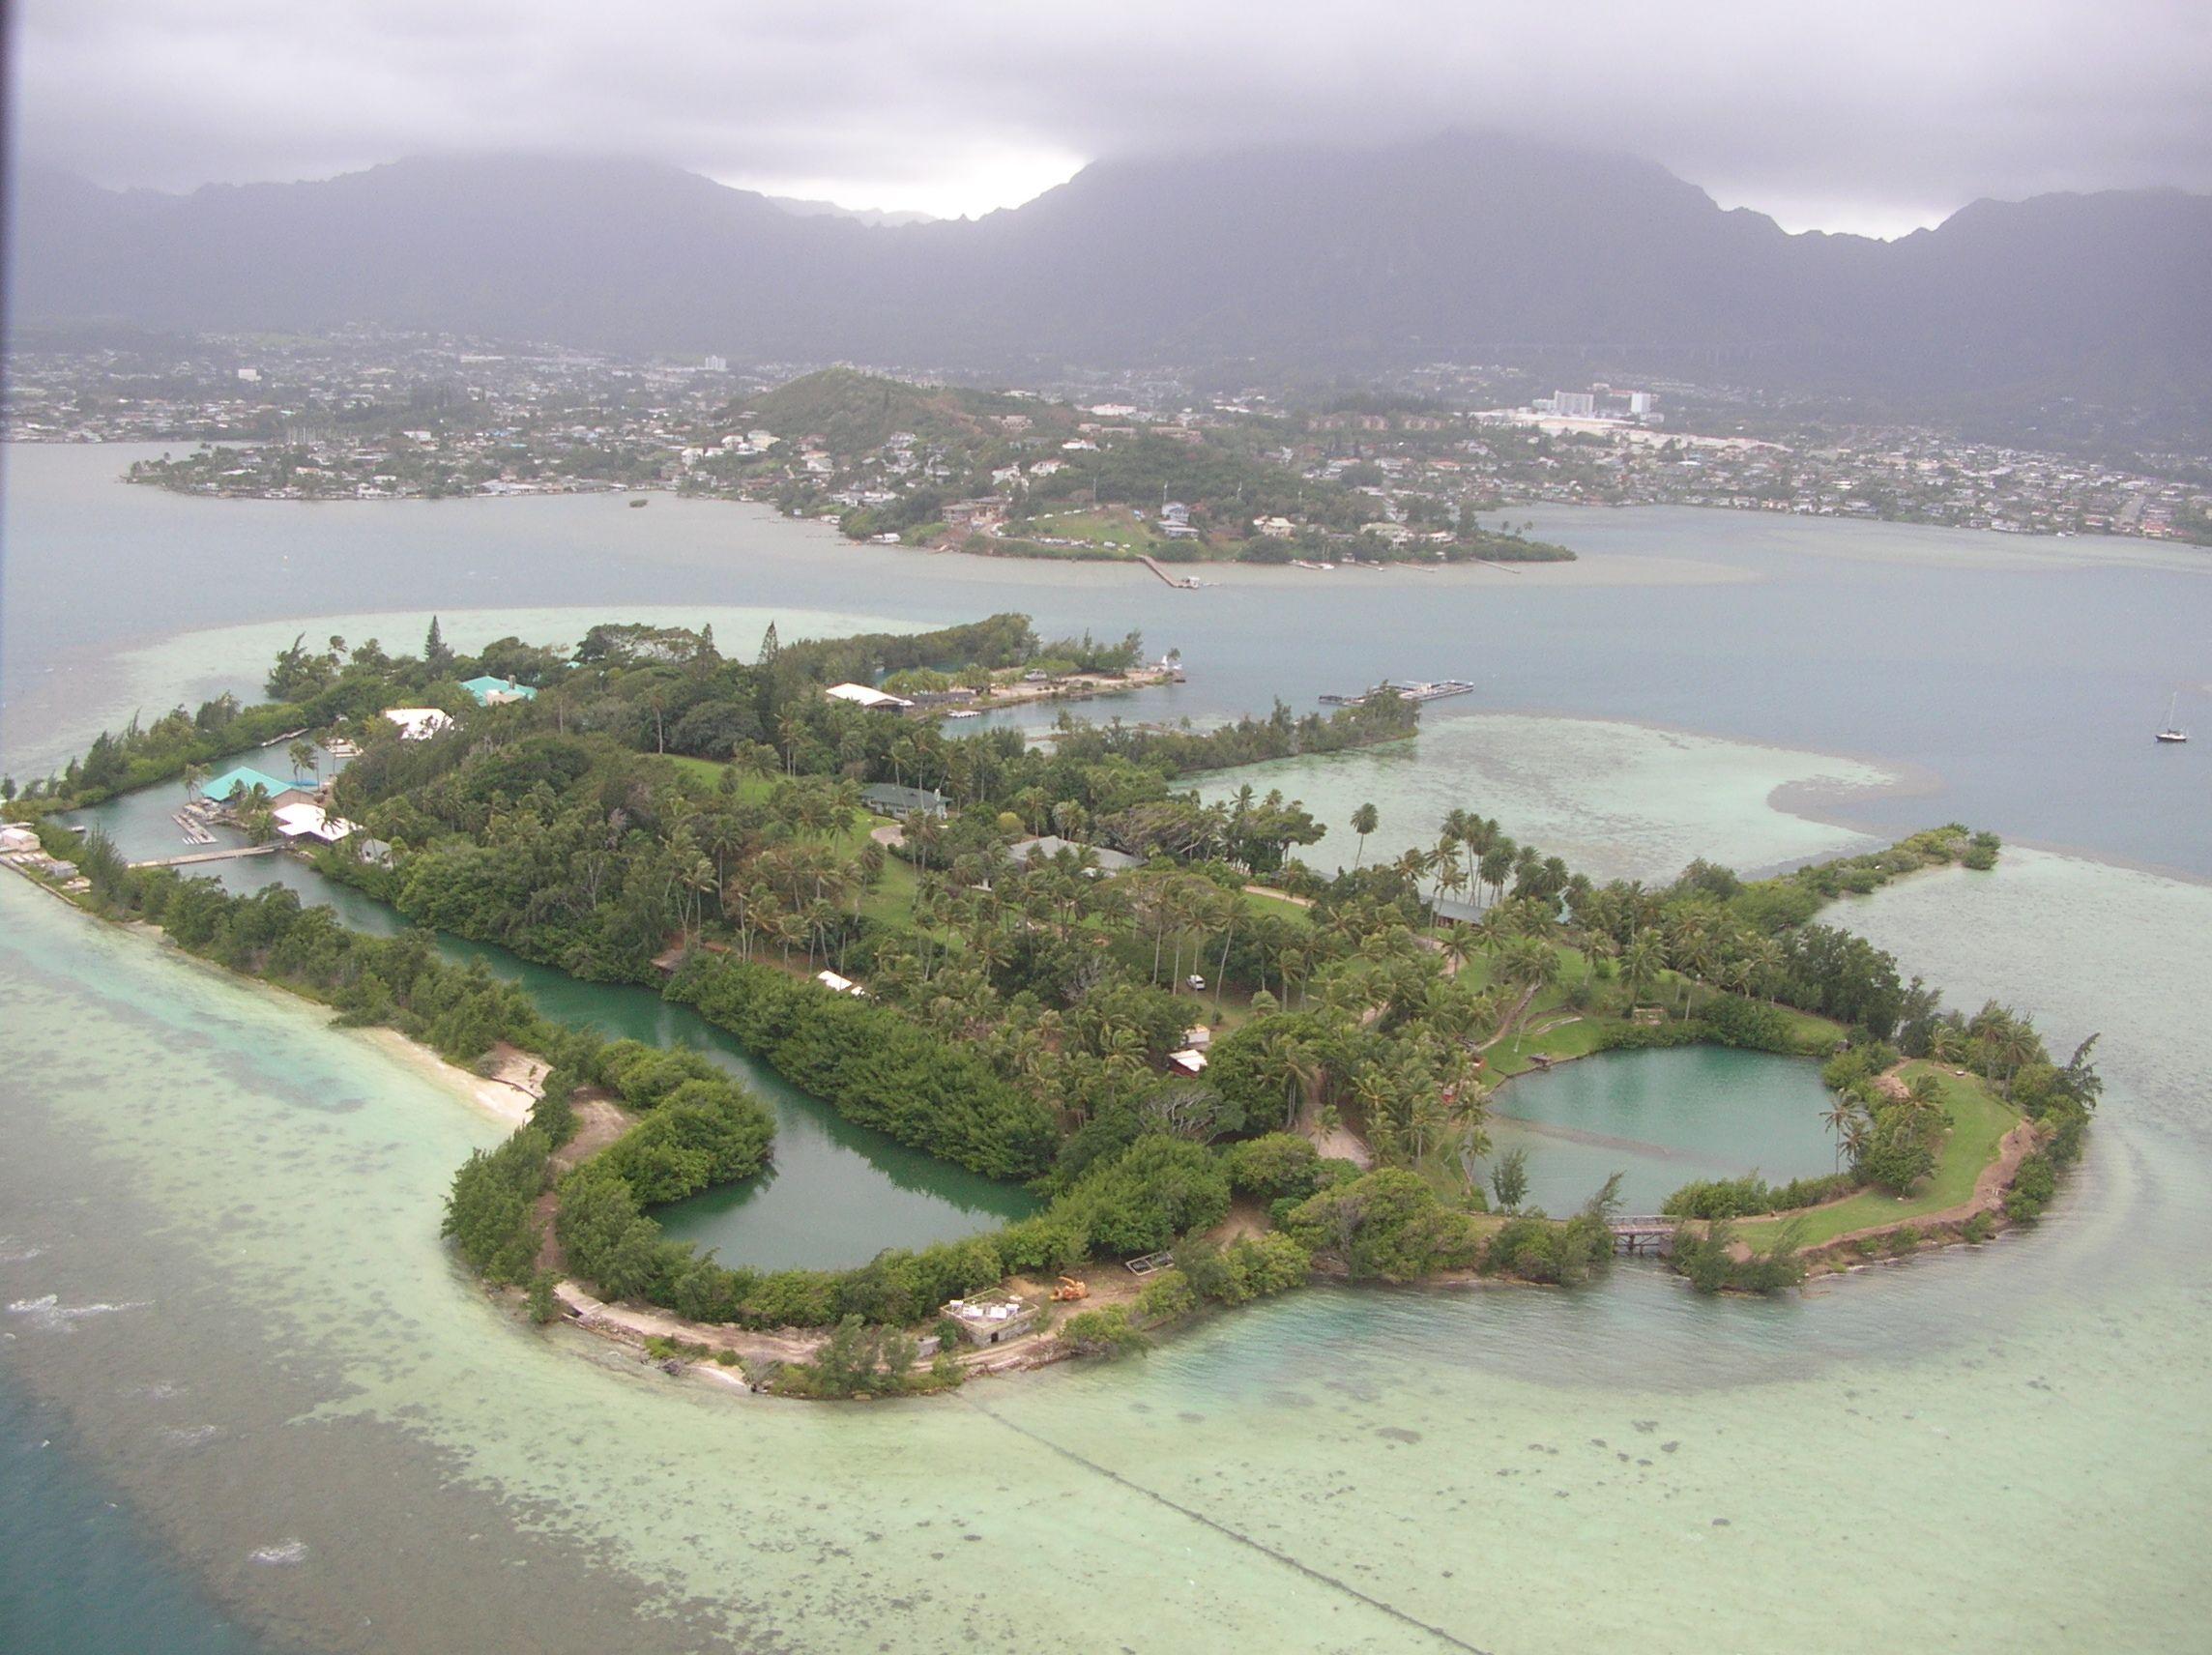 Coconut island in kaneohe bay oahu hawaii now the